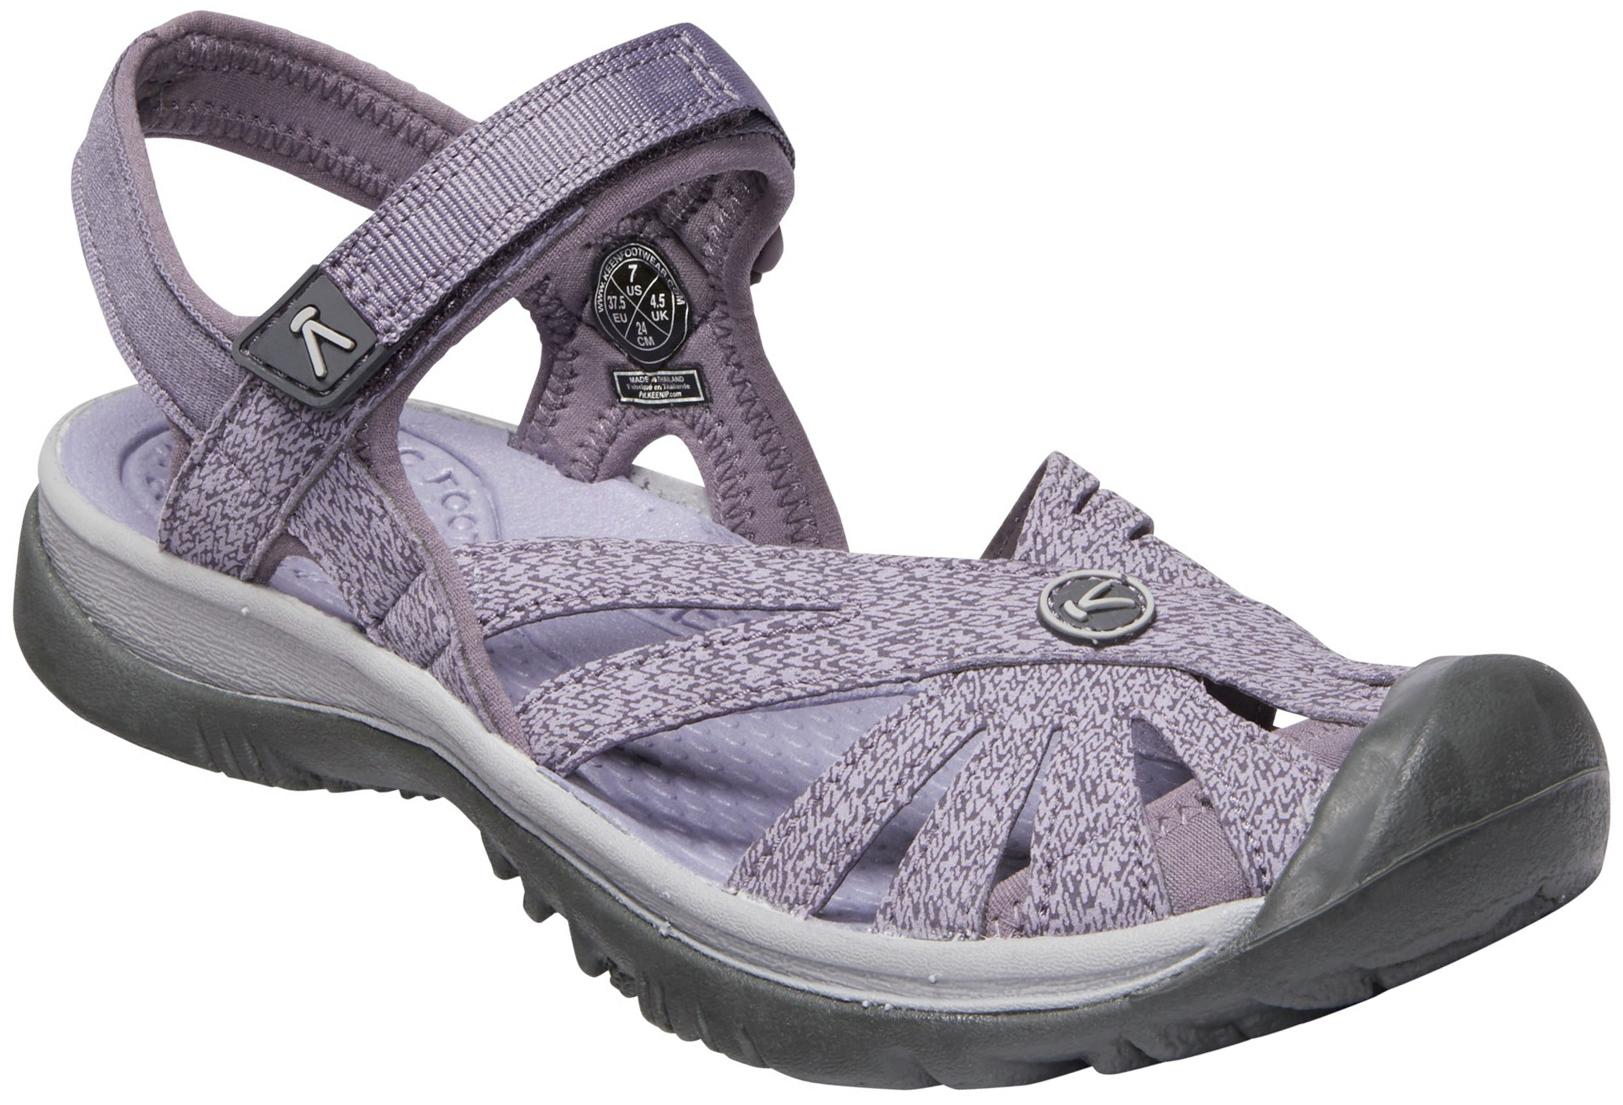 81a5130f8498 Sandals